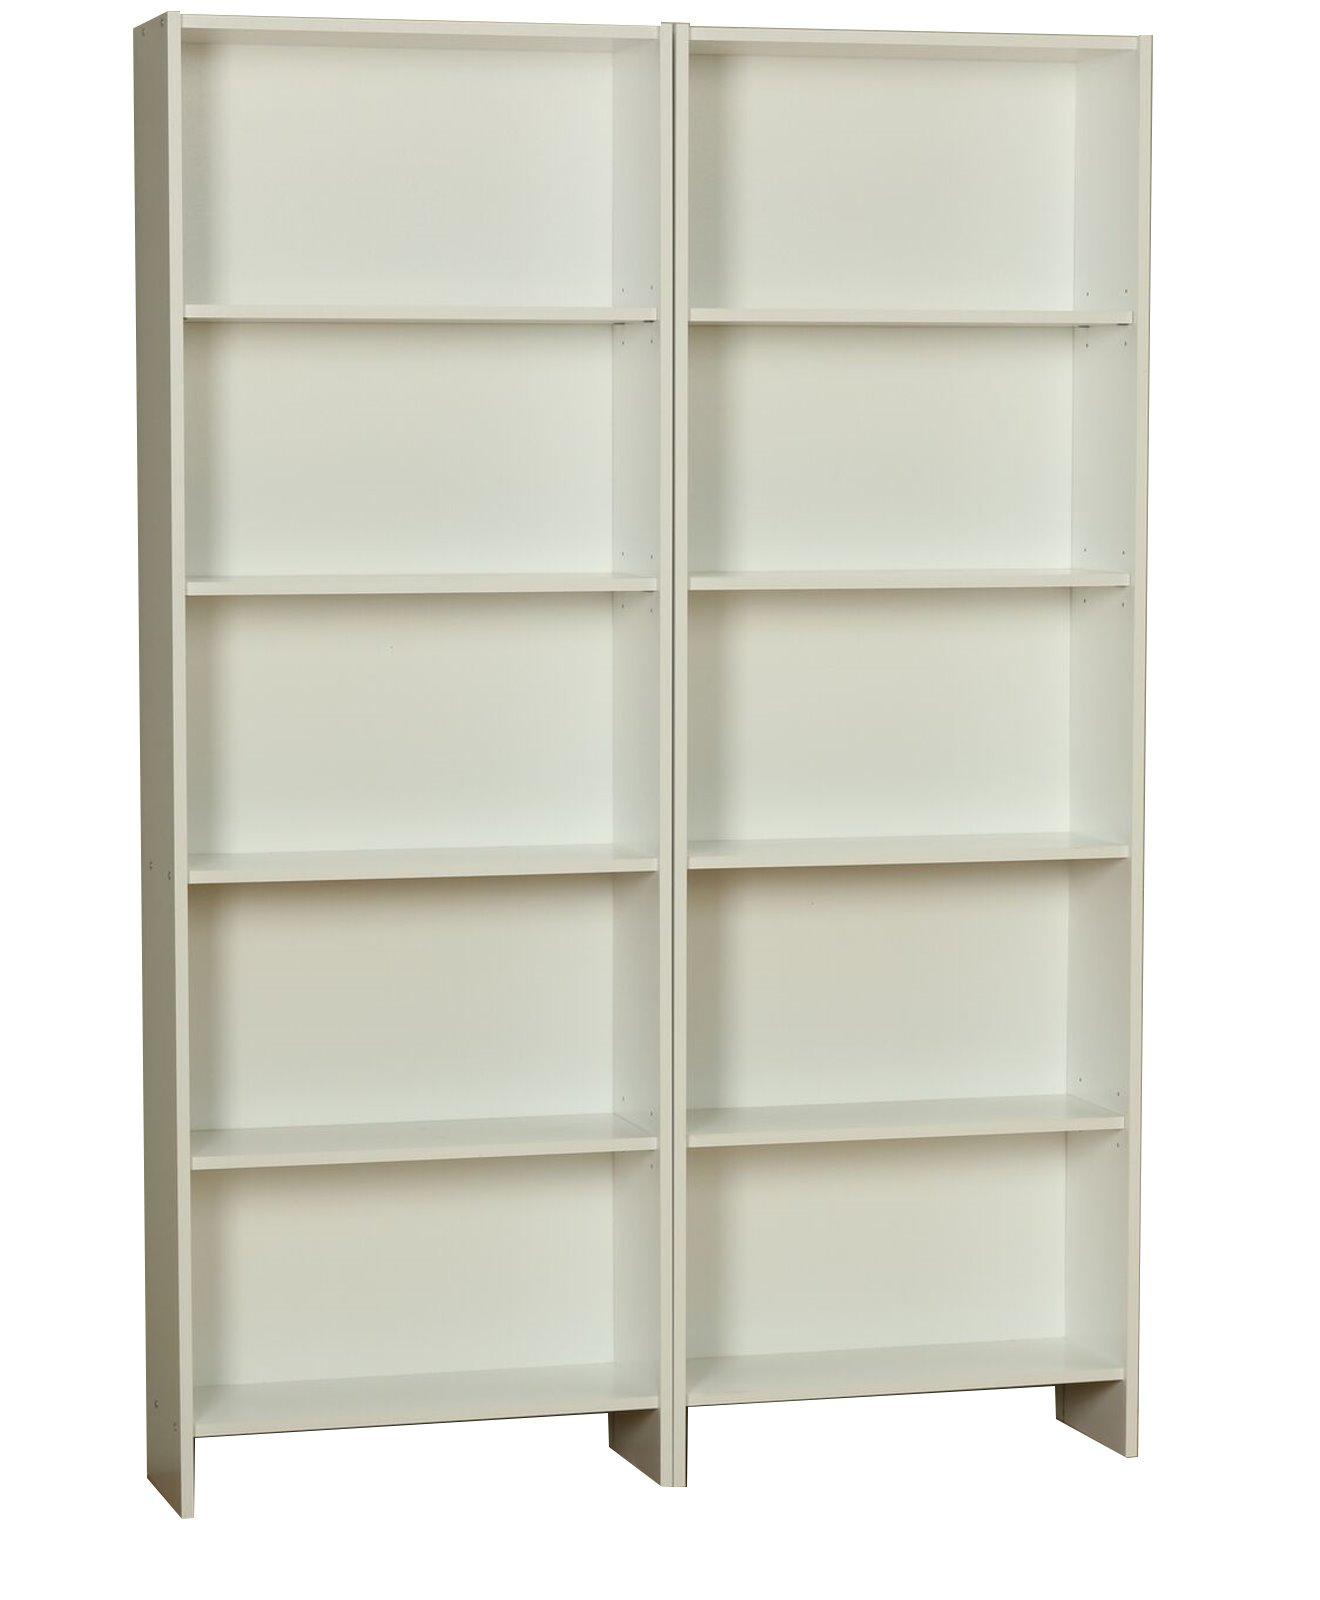 2x b cherregal section standregal wandregal wohnregal regal schrank b ro wei ebay. Black Bedroom Furniture Sets. Home Design Ideas